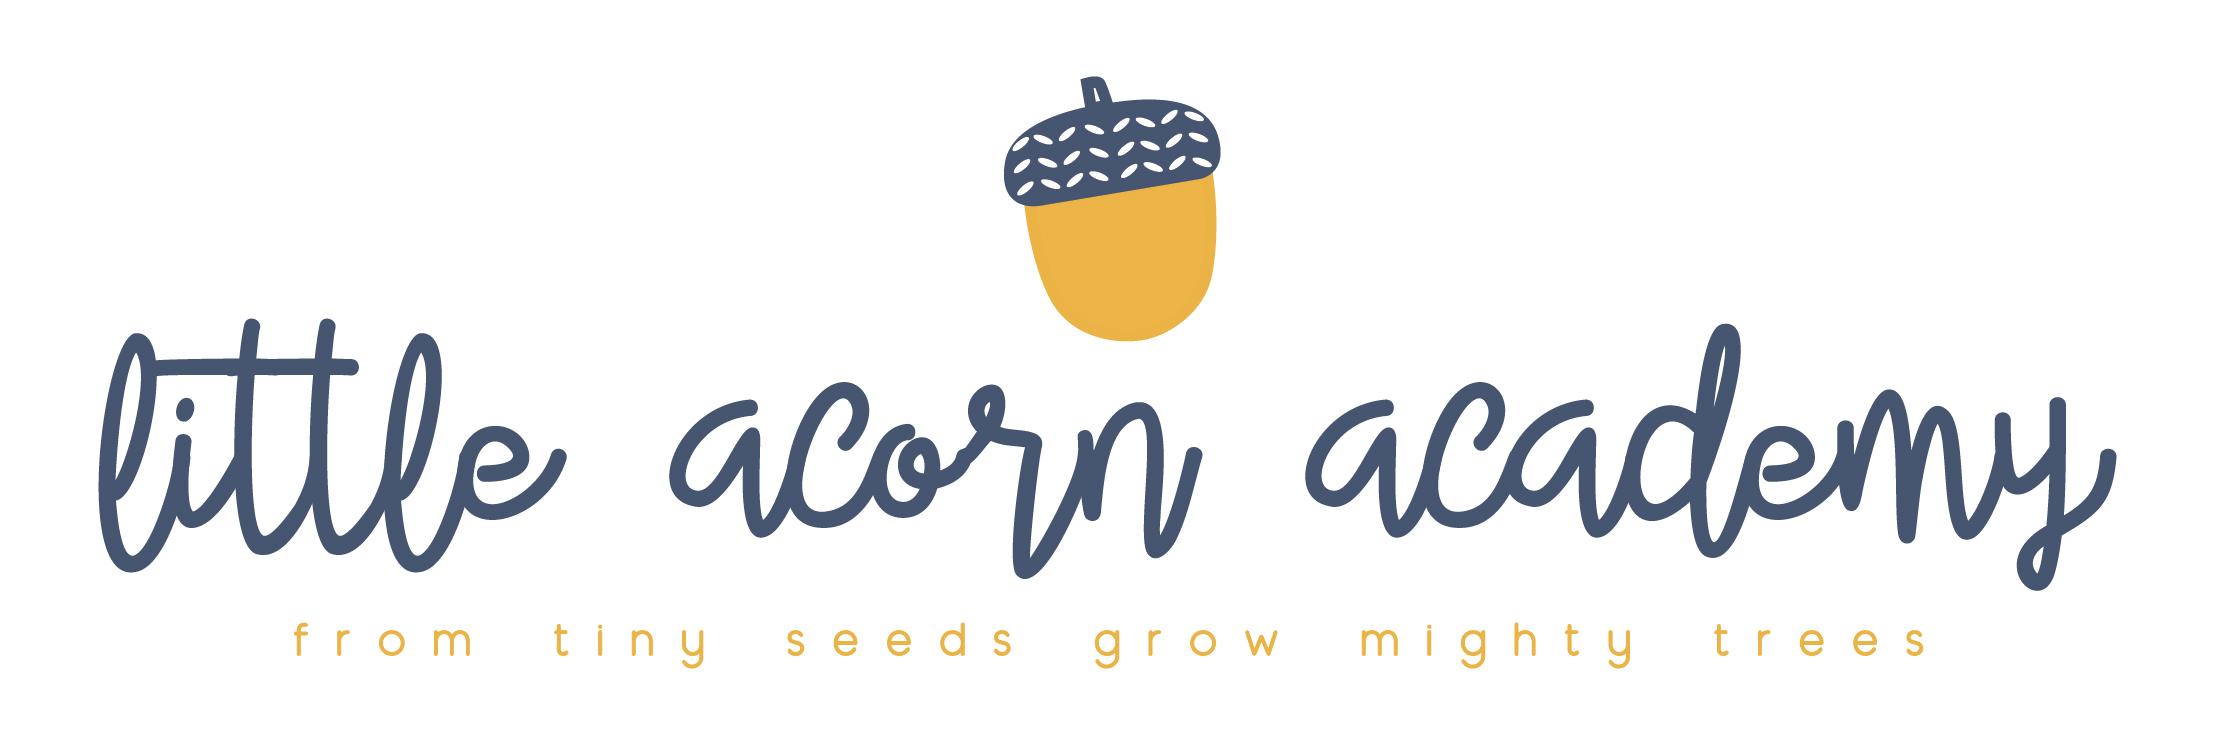 little acorn academy logo